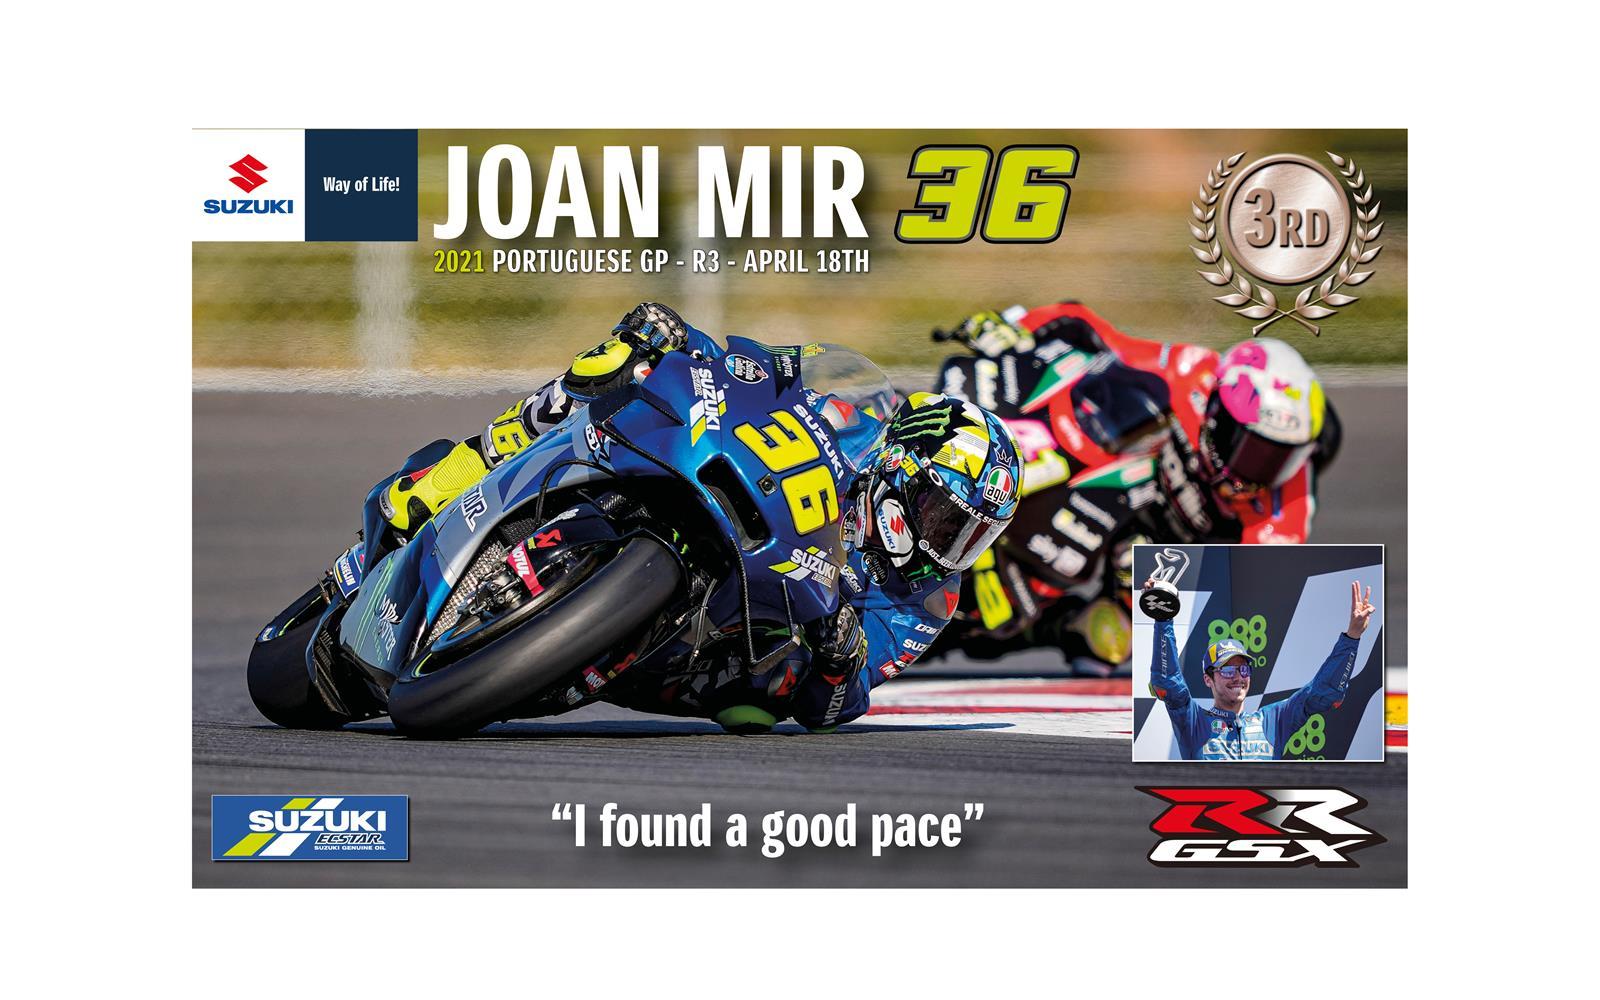 Joan MIR Suzuki Wallpaper Online